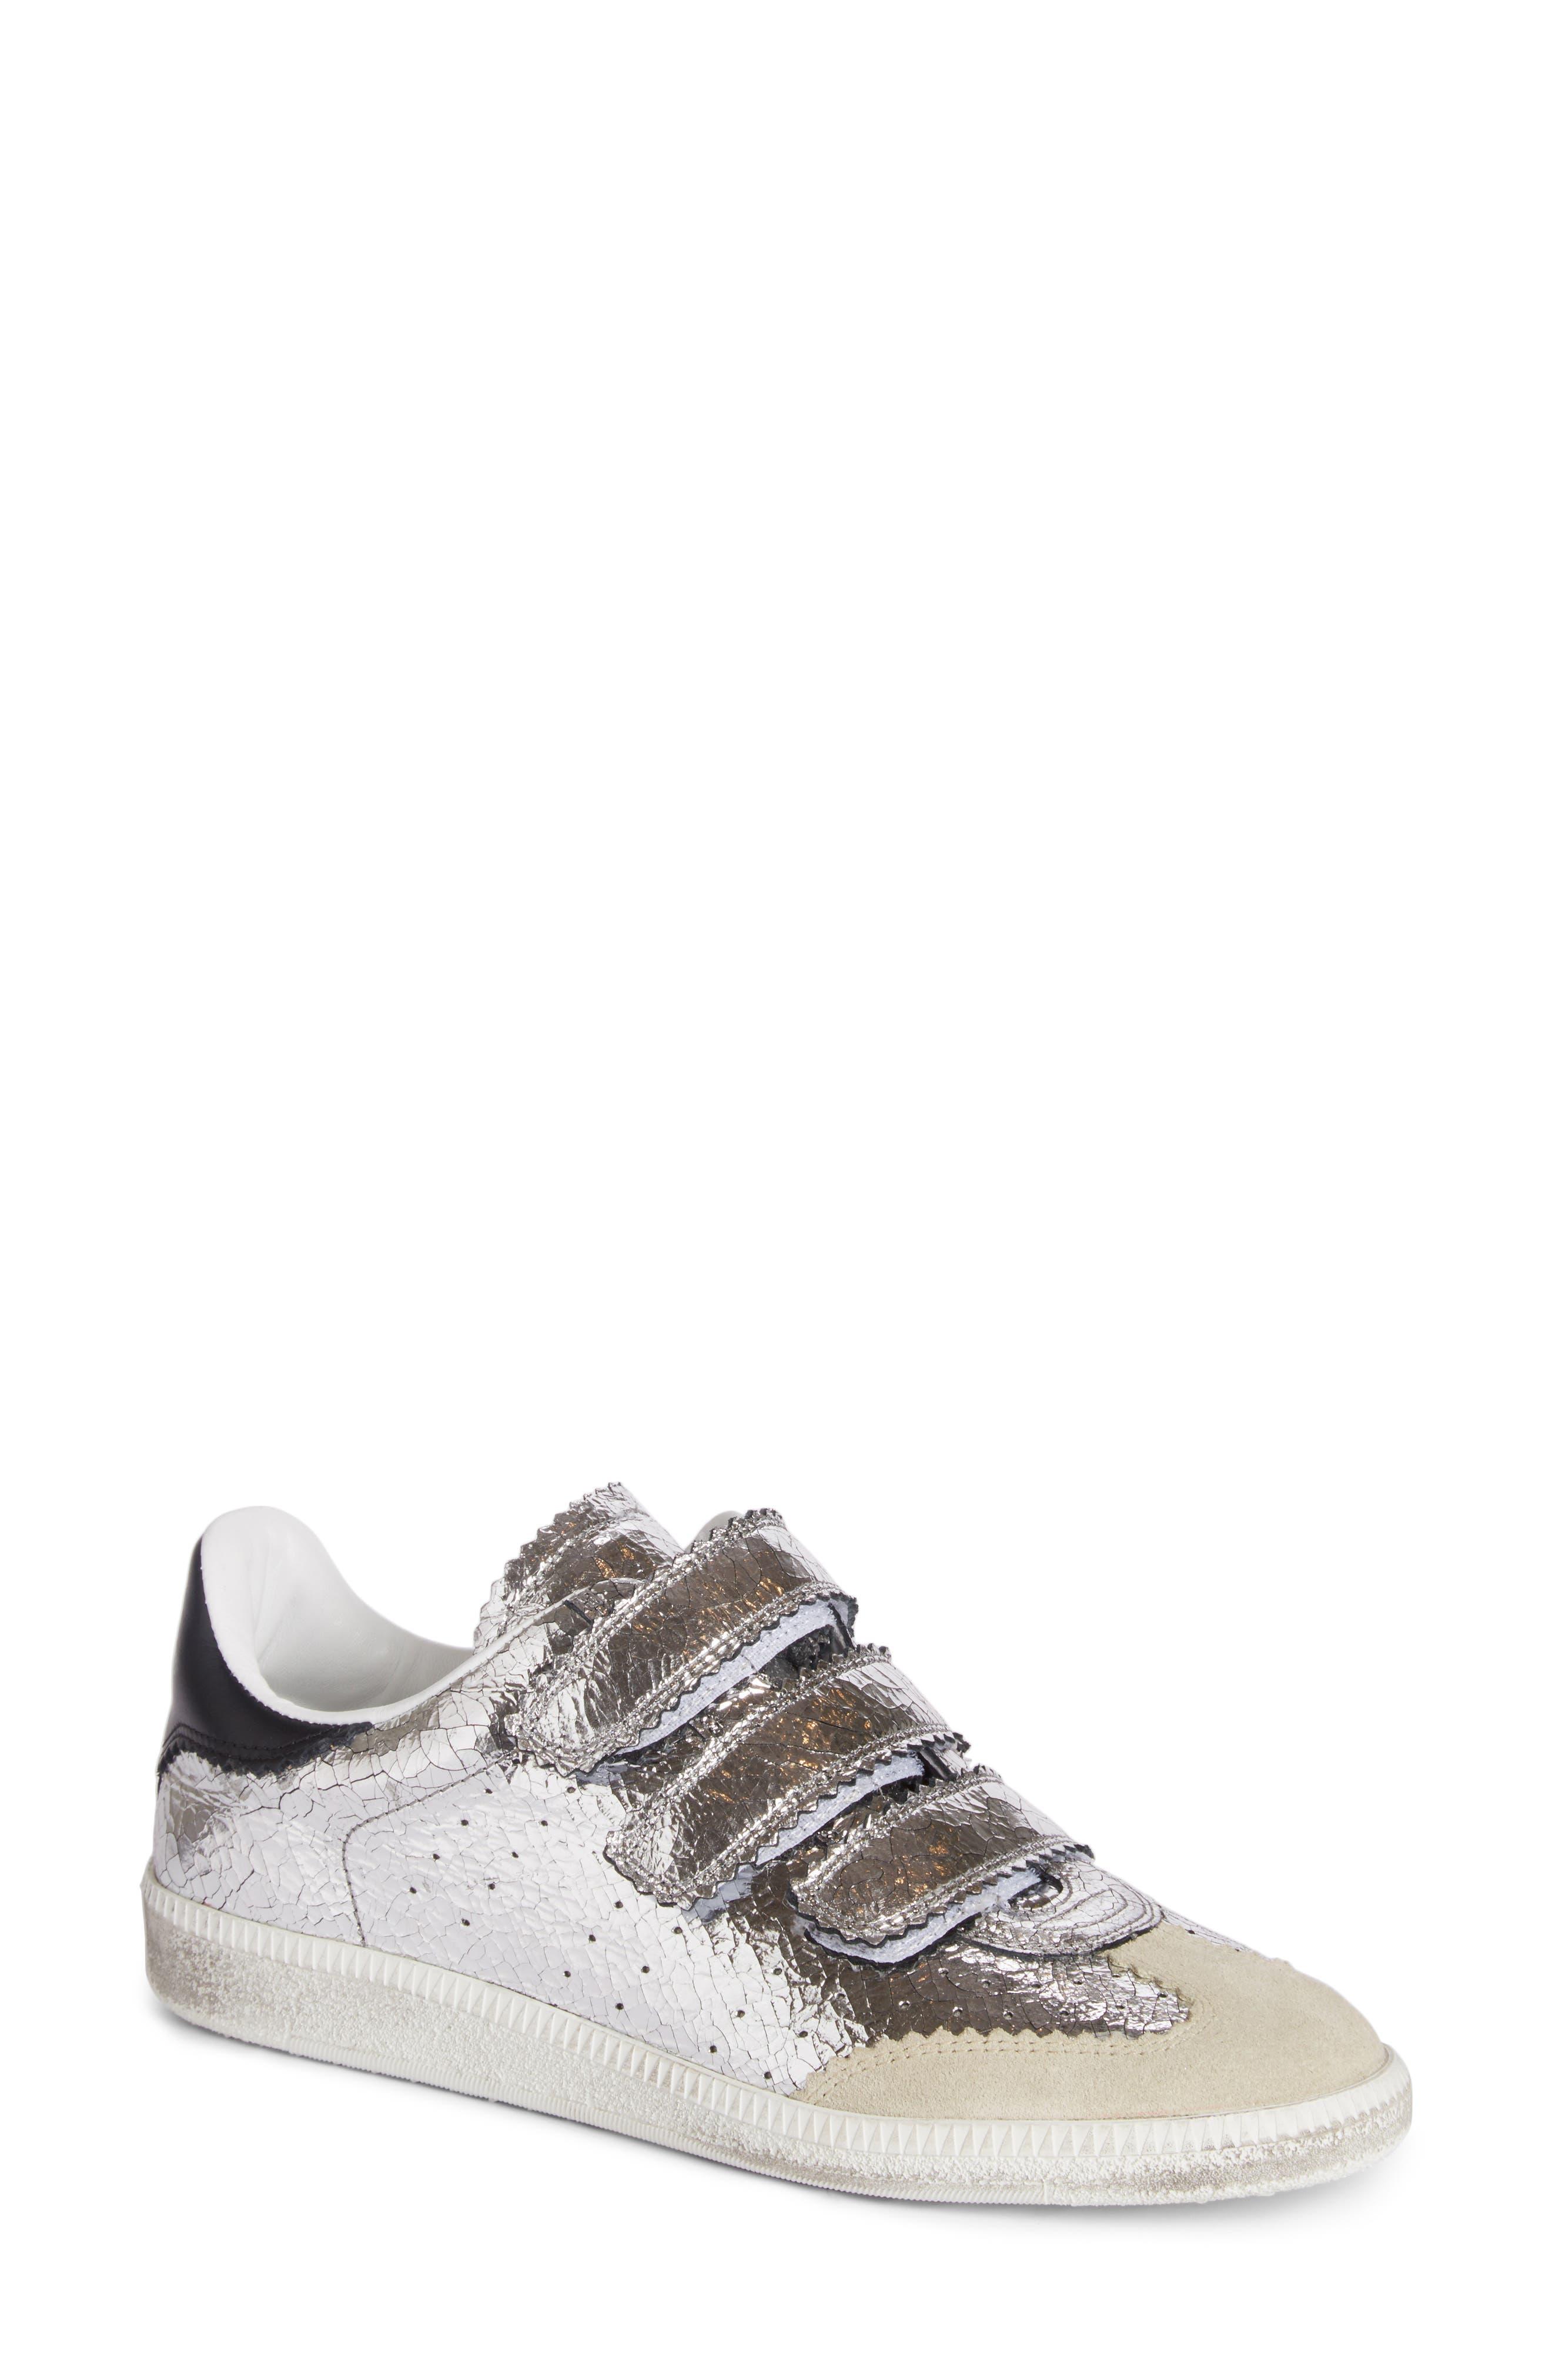 Alternate Image 1 Selected - Isabel Marant Beth Sneaker (Women)